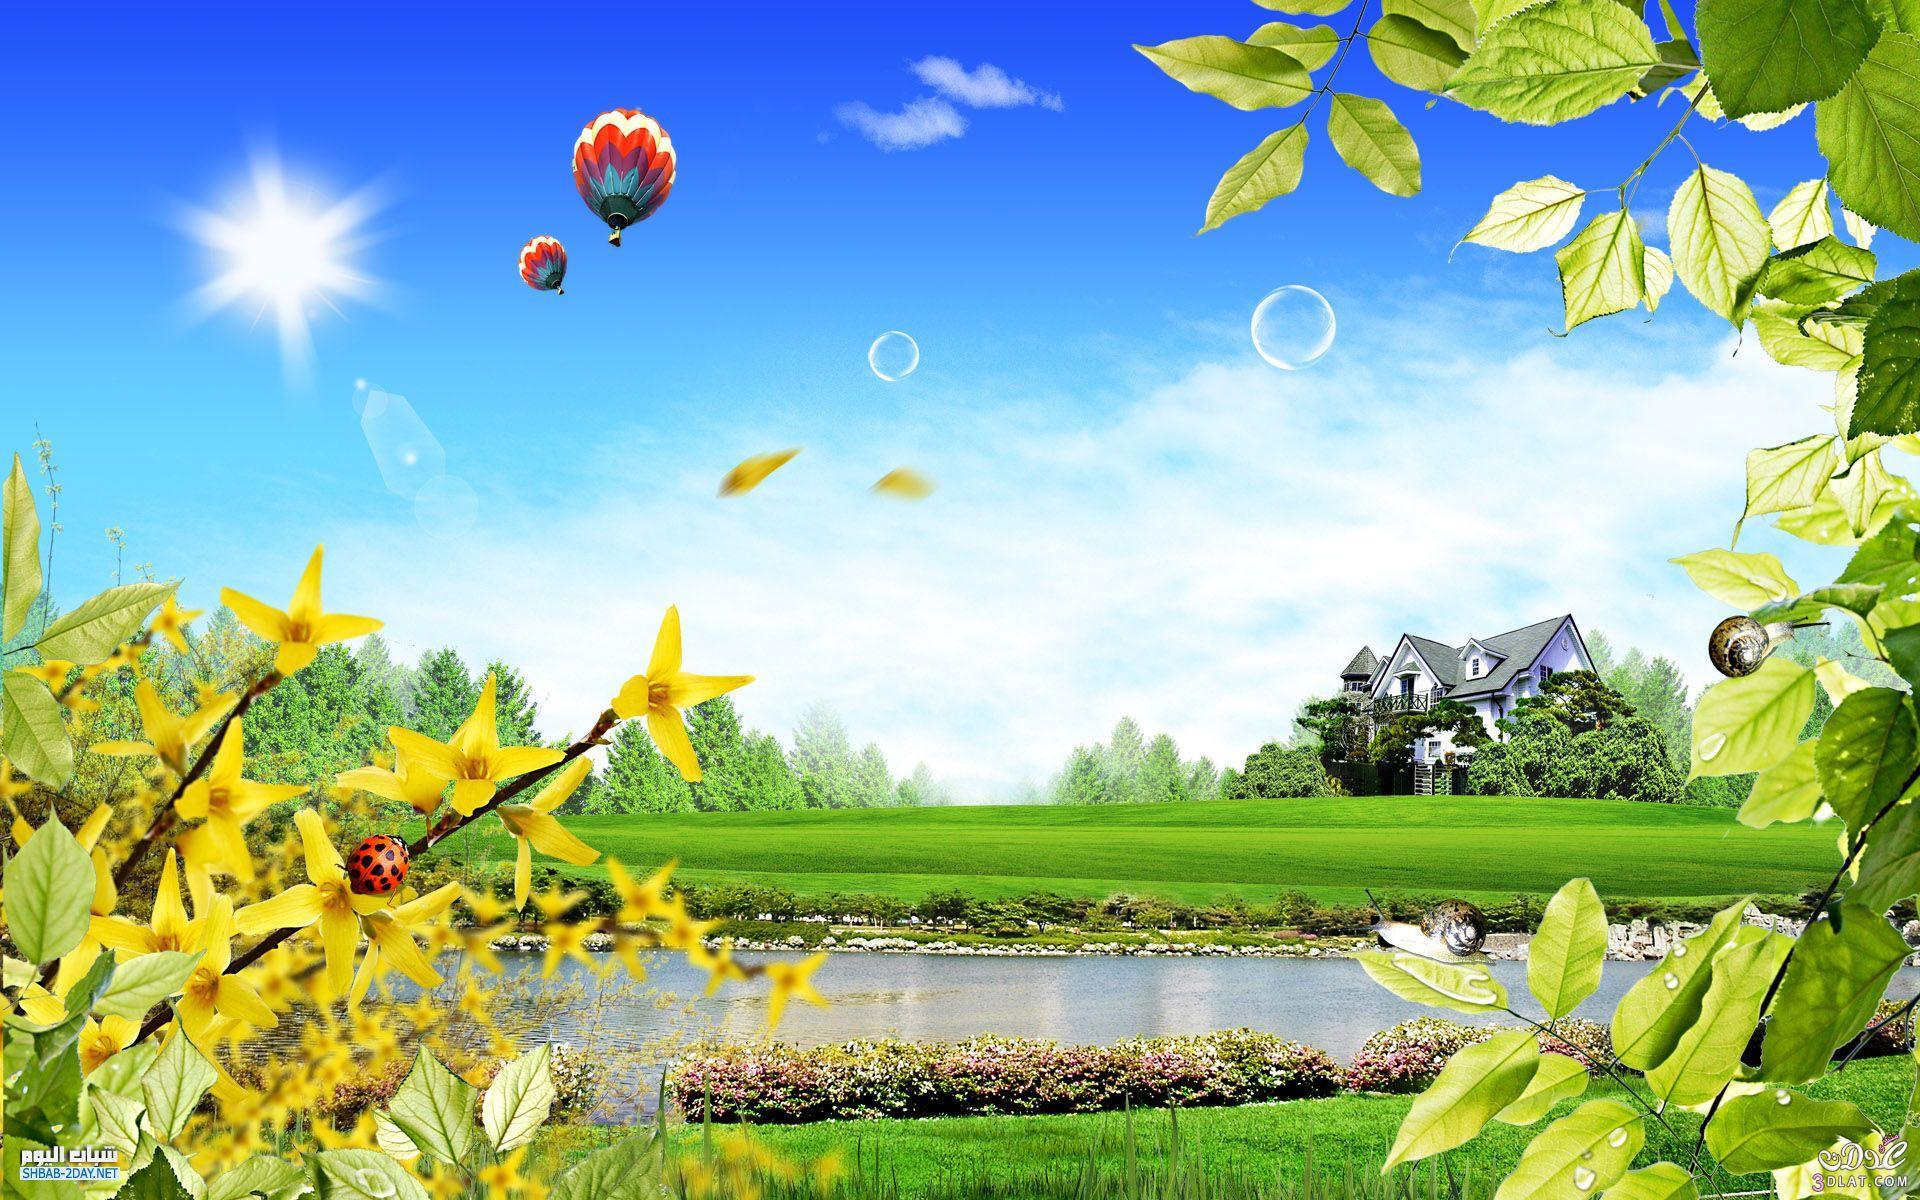 بالصور صور للطبيعه روعه,صور طبيعه جميله 967 4